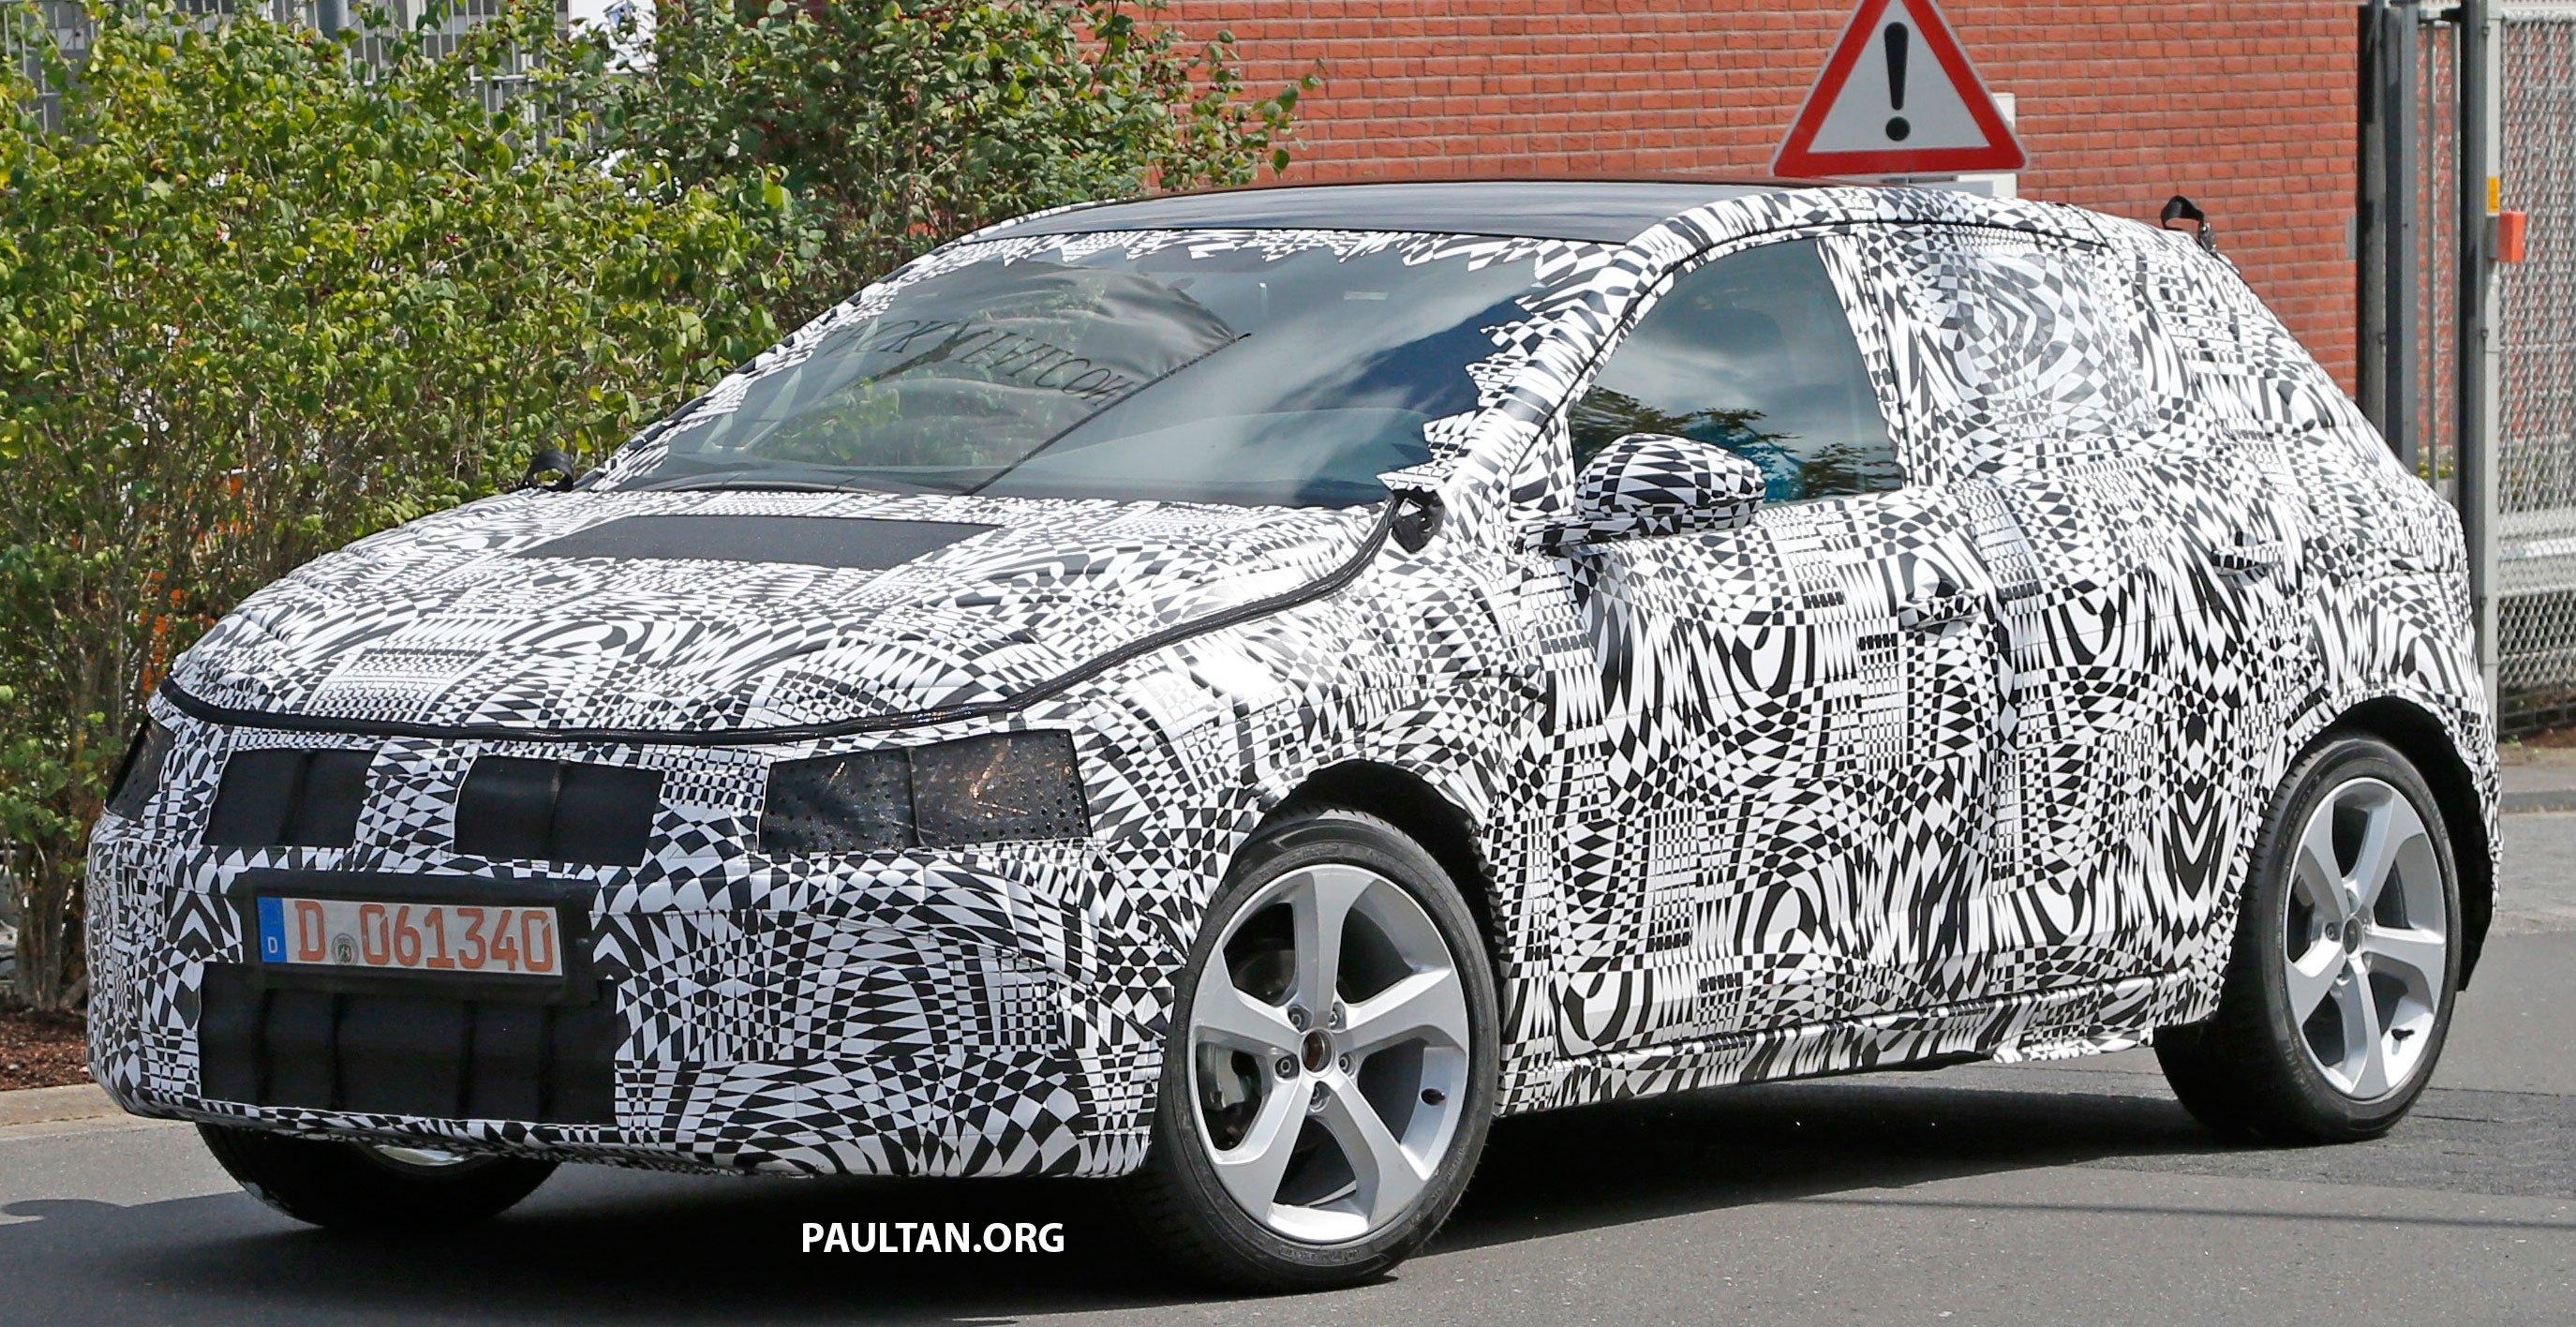 Spyshots 2018 Volkswagen Polo Polo Gti Spotted Paul Tan